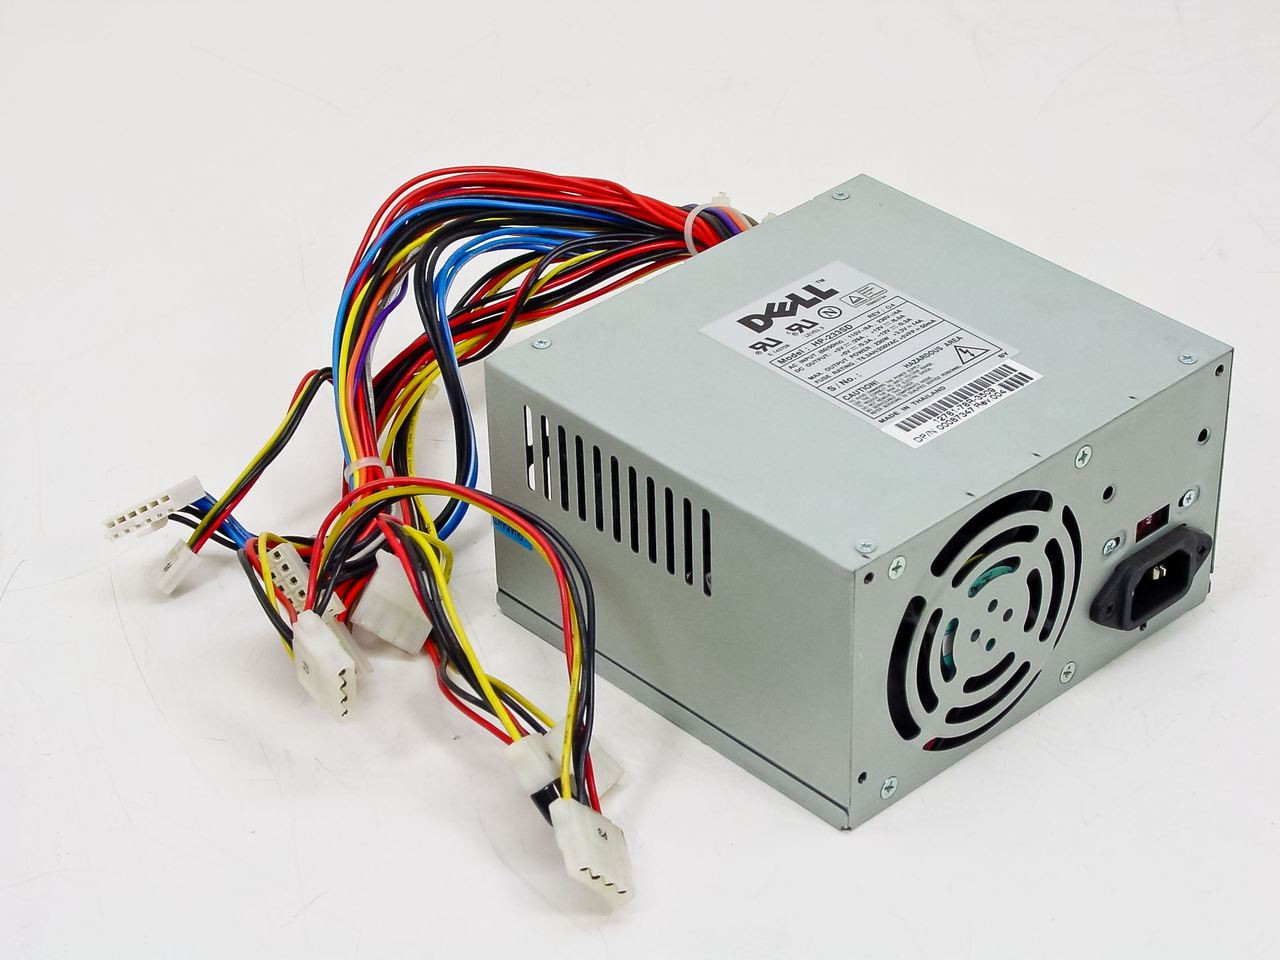 power supply model h275p 01 wiring diagram supply dell power supply pinout diagram dell laptop power [ 1280 x 960 Pixel ]